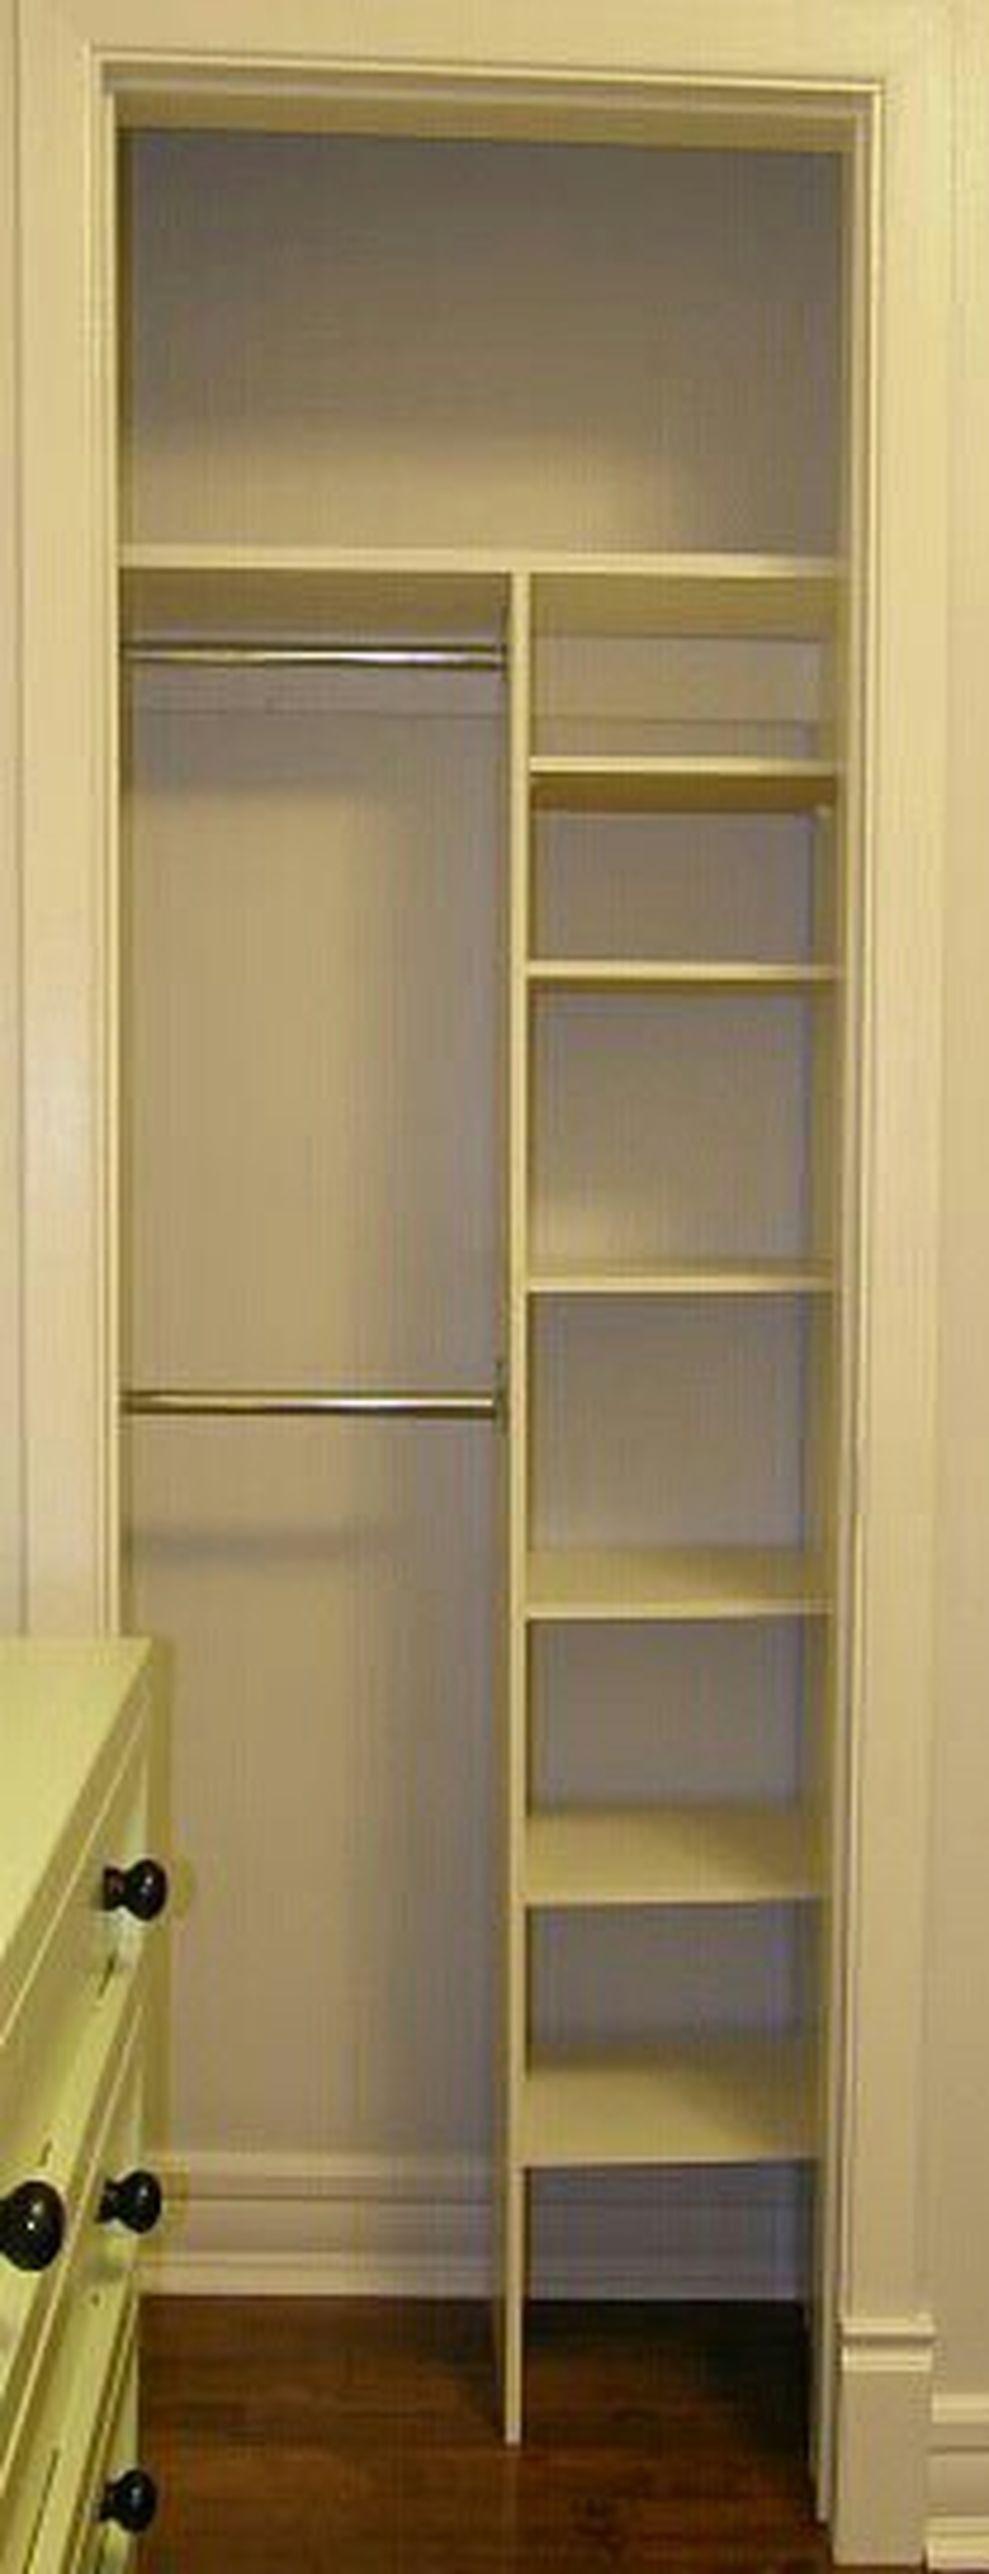 shelf redoubtable ideas bathroom decorating shelving closet agreeable cool